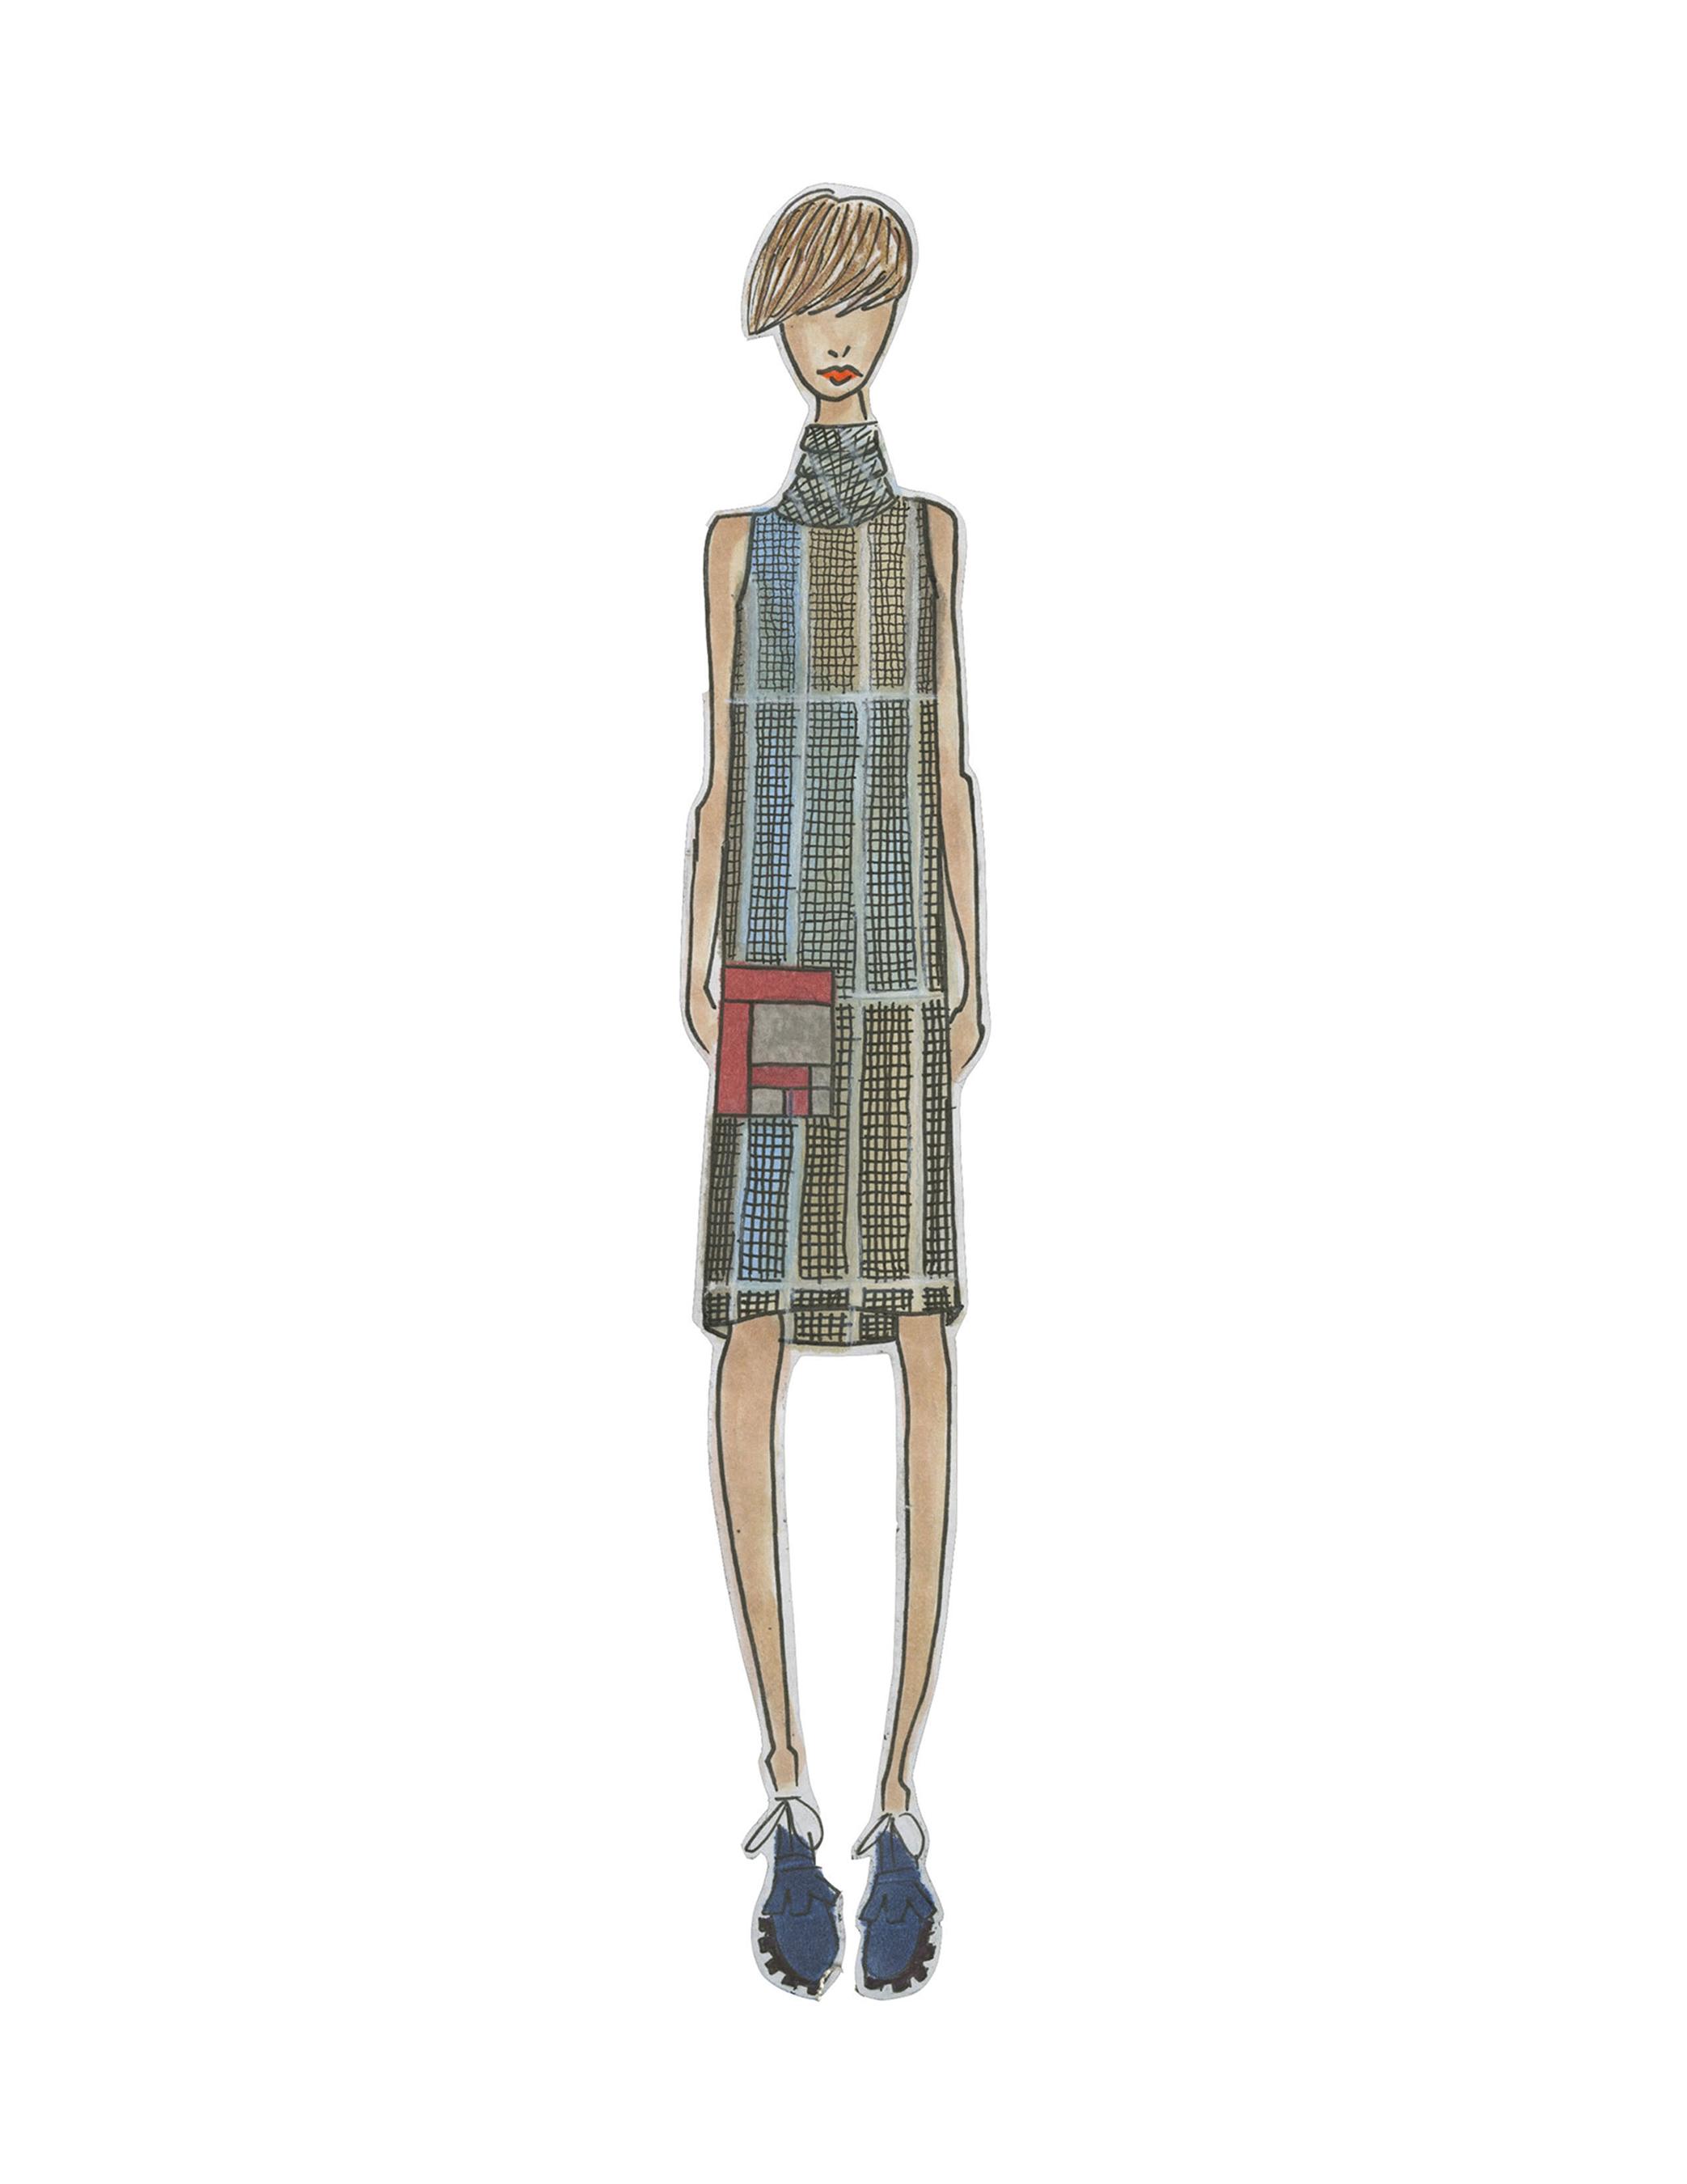 Nina Perdomo Student Fashion Design Program Aaa The Art Institute Of New York City 2luxury2 Com